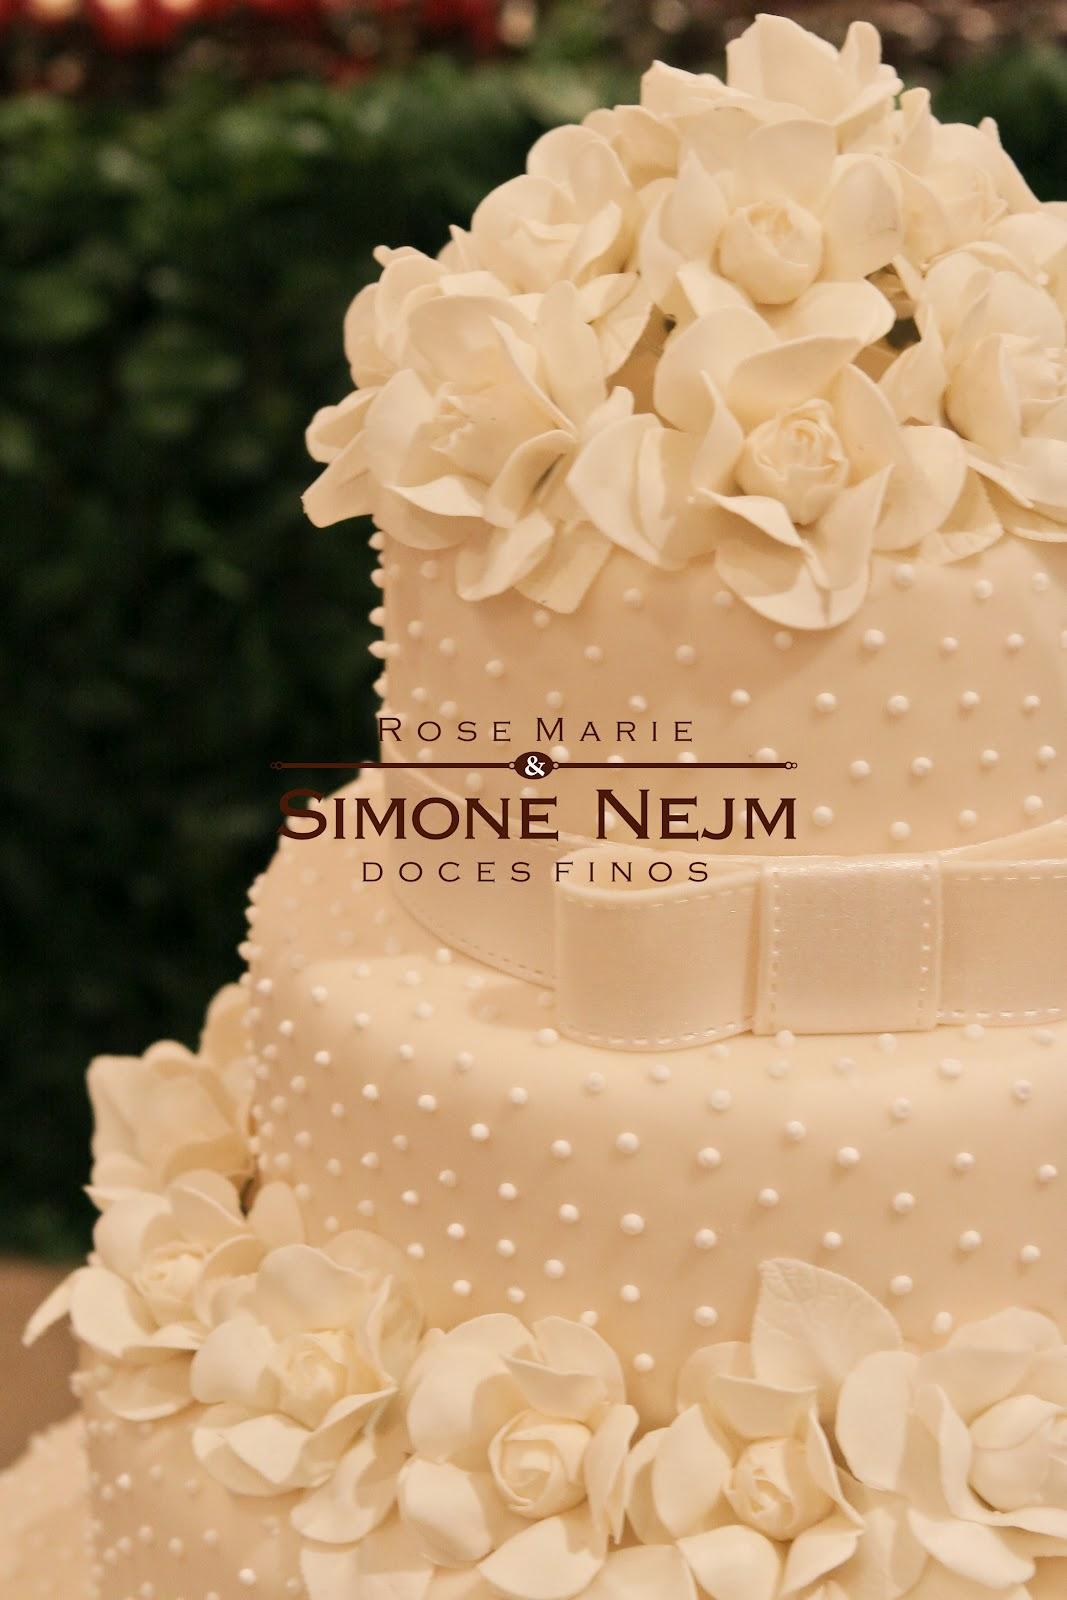 Rose Marie & Simone Nejm Doces Finos | eleroticariodenadie